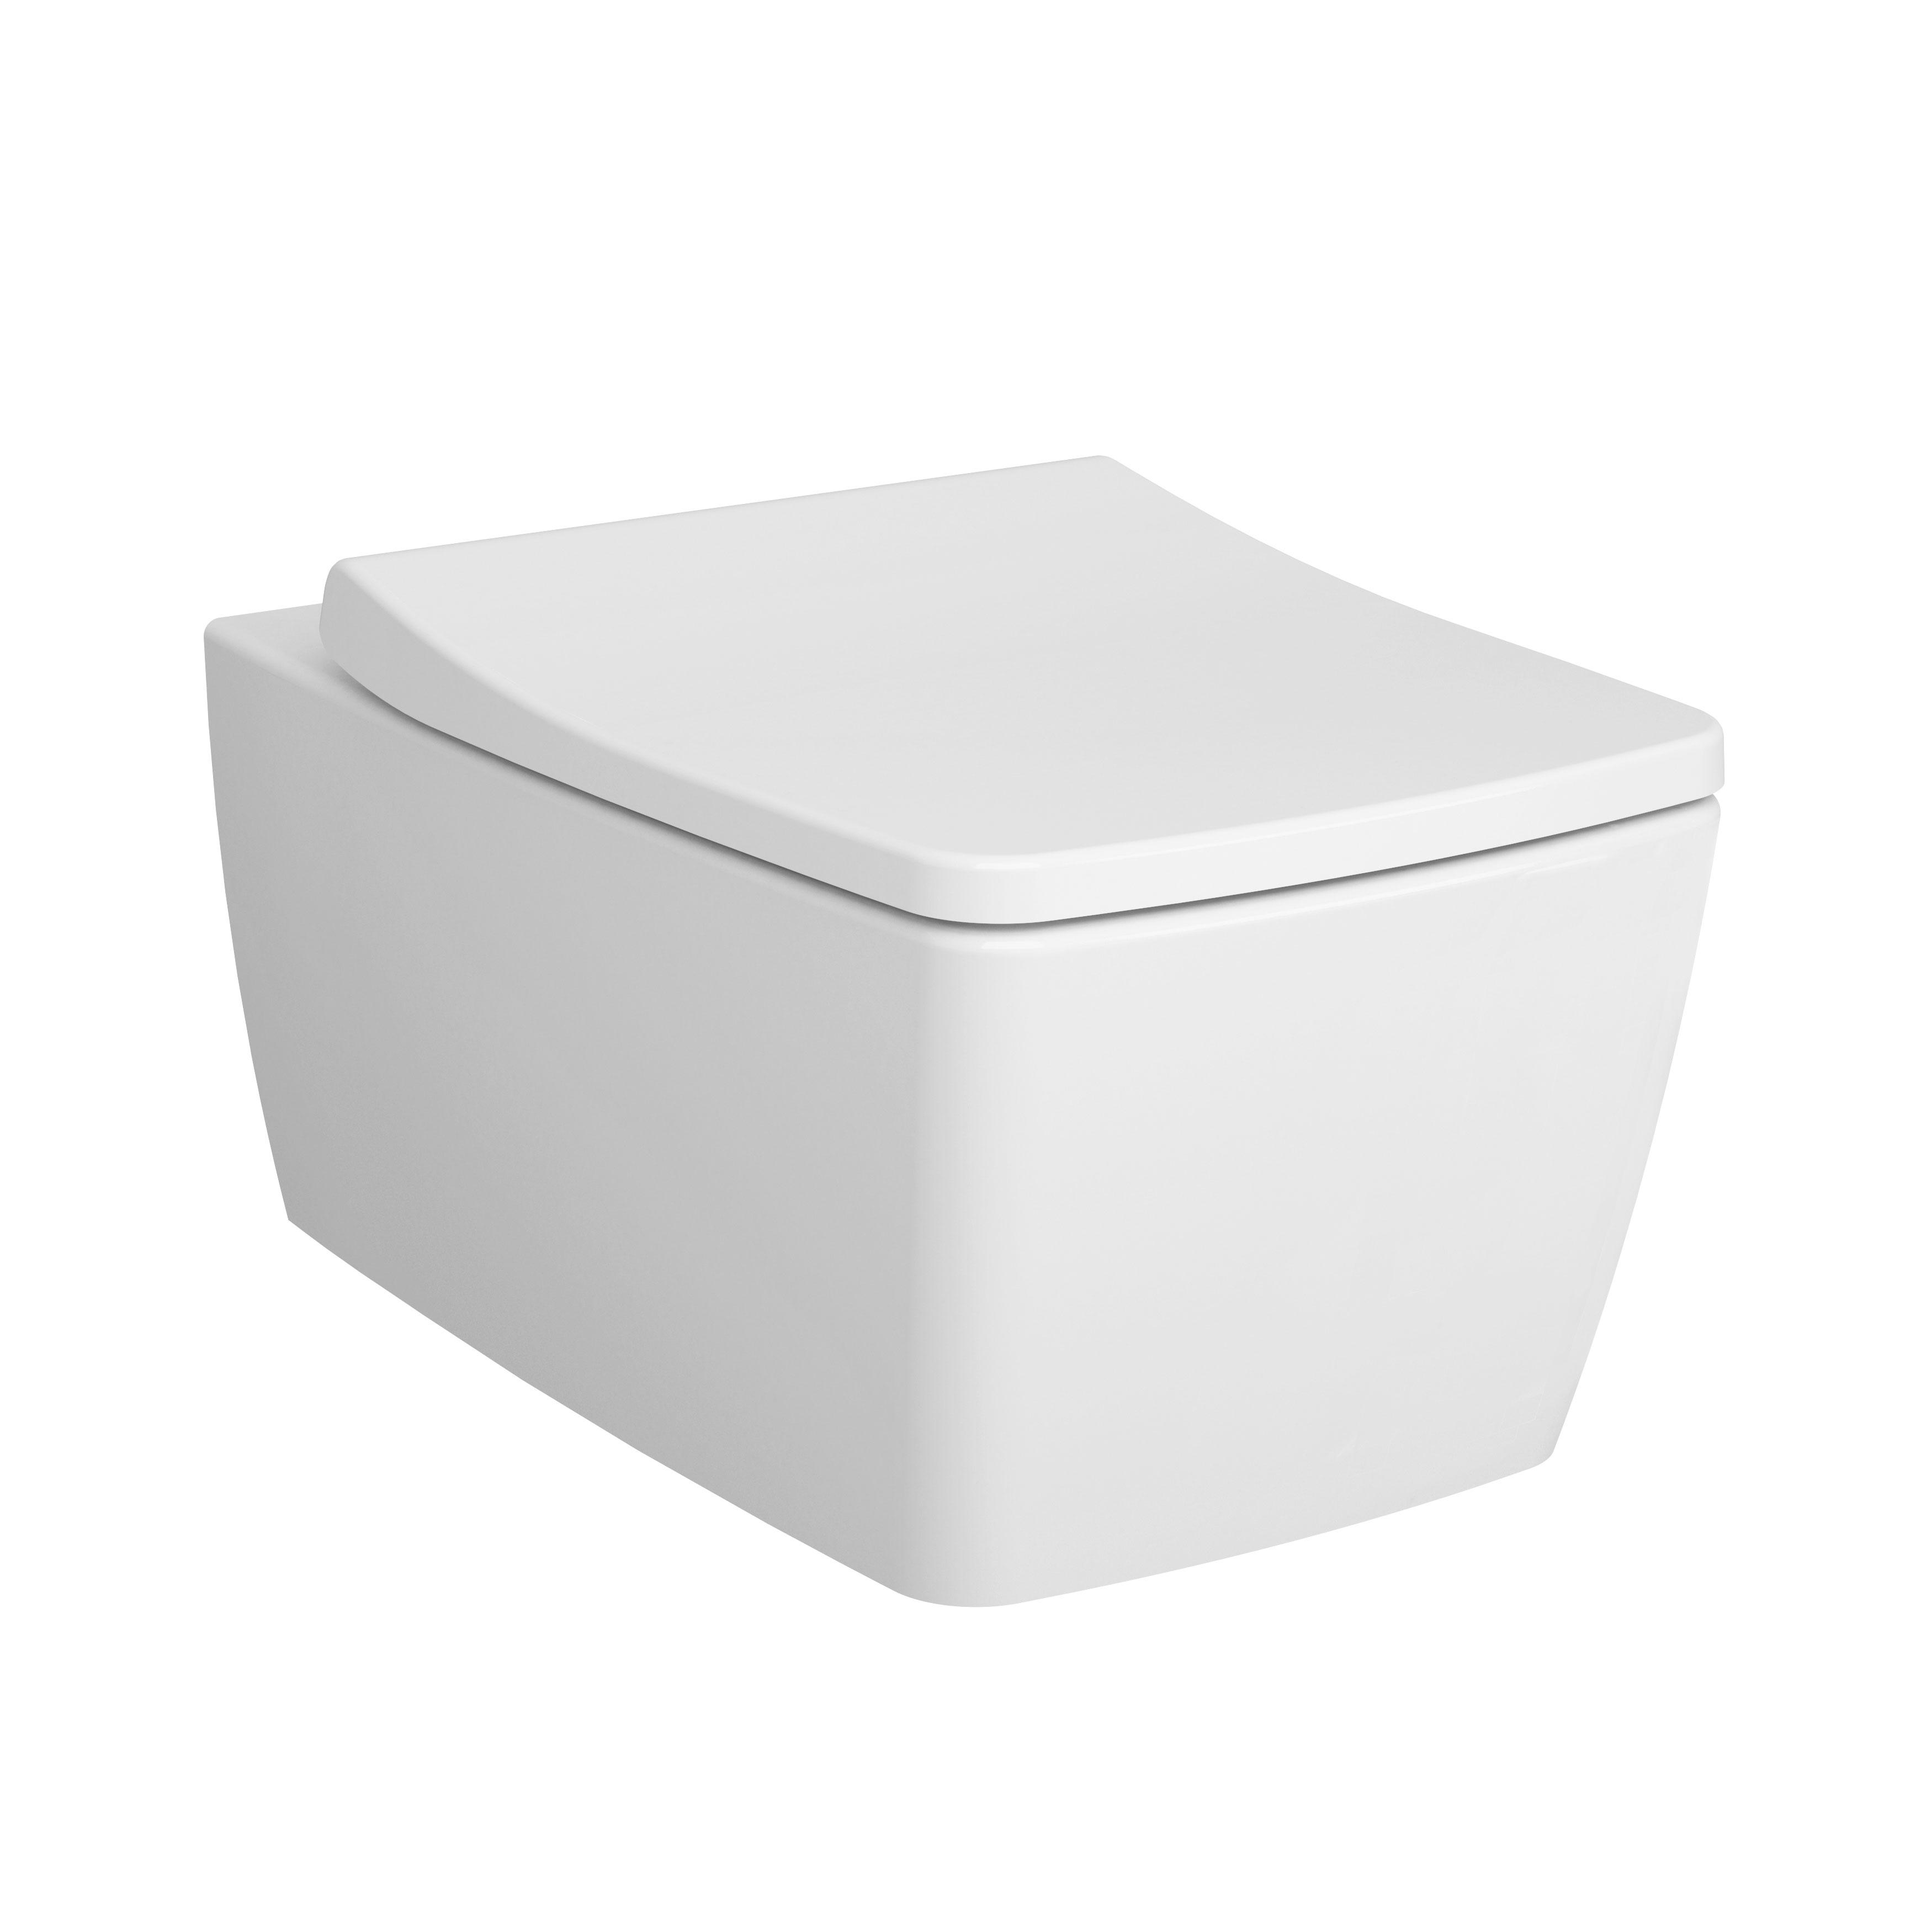 Metropole Pack WC suspendu, abattant Duroplast, fermeture douce, blanc